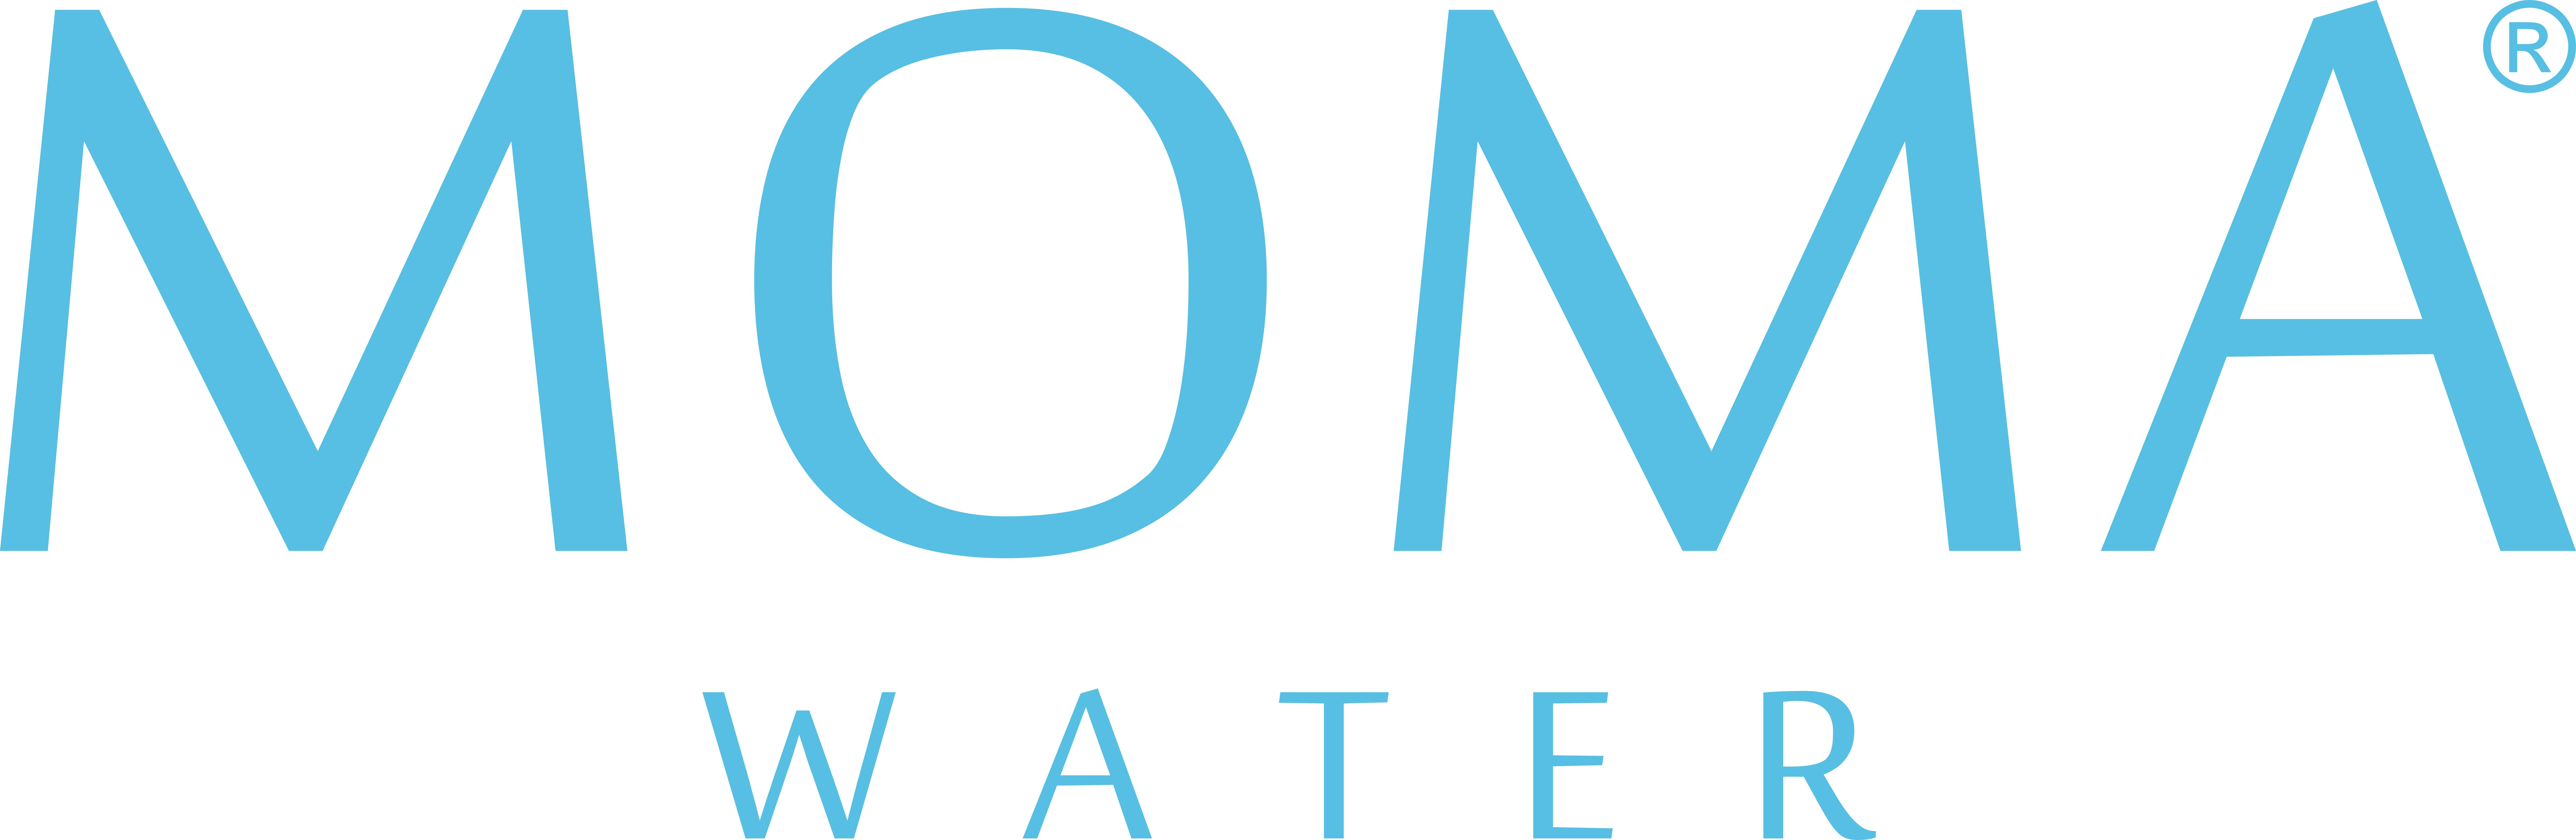 Moma logo clipart image royalty free stock HD Sponsor - Moma Water Logo Png Transparent PNG Image ... image royalty free stock